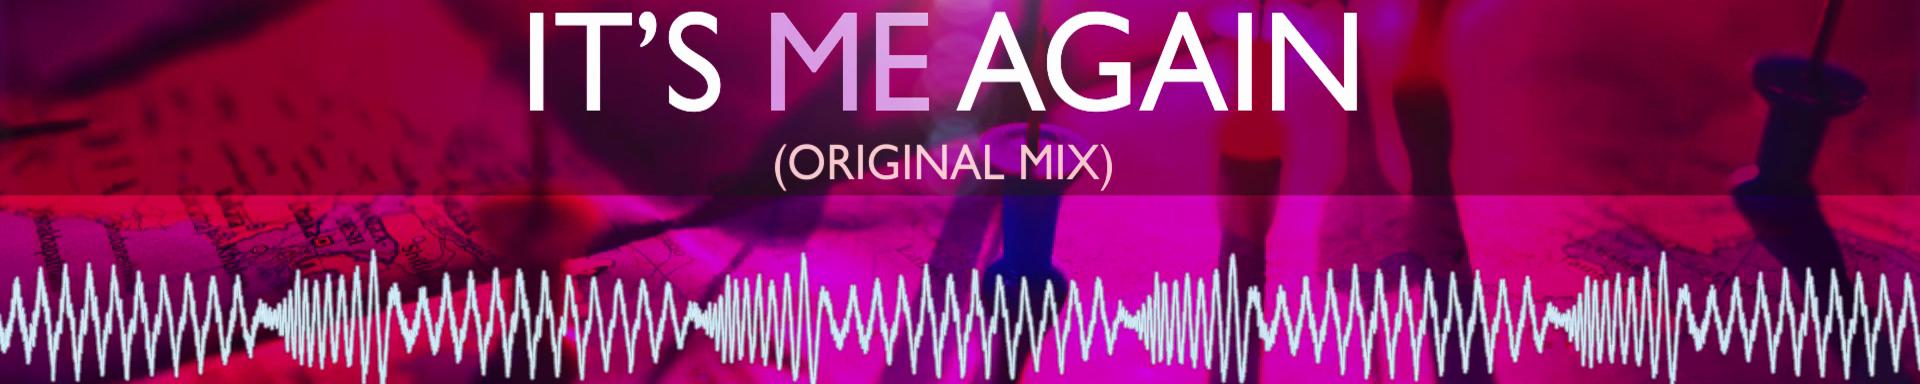 ITS ME AGAIN (RADIO MIX) - (ALEXTRACKONE.ES) Ref Ato0001 - FREE DOWNLOAD